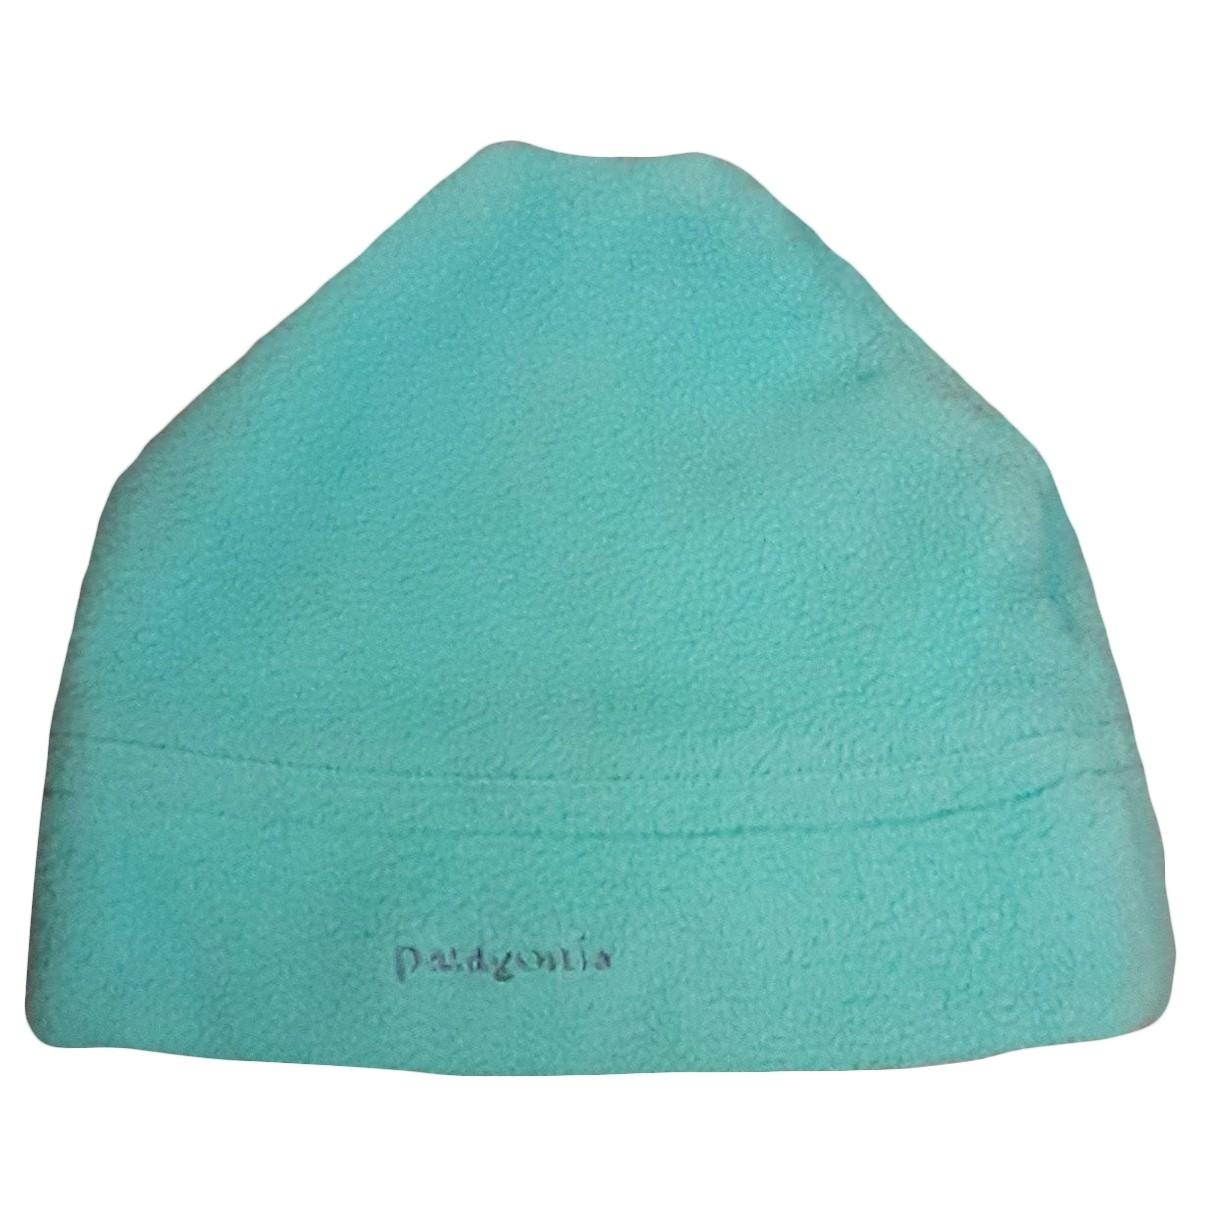 Patagonia \N Blue hat for Women M International